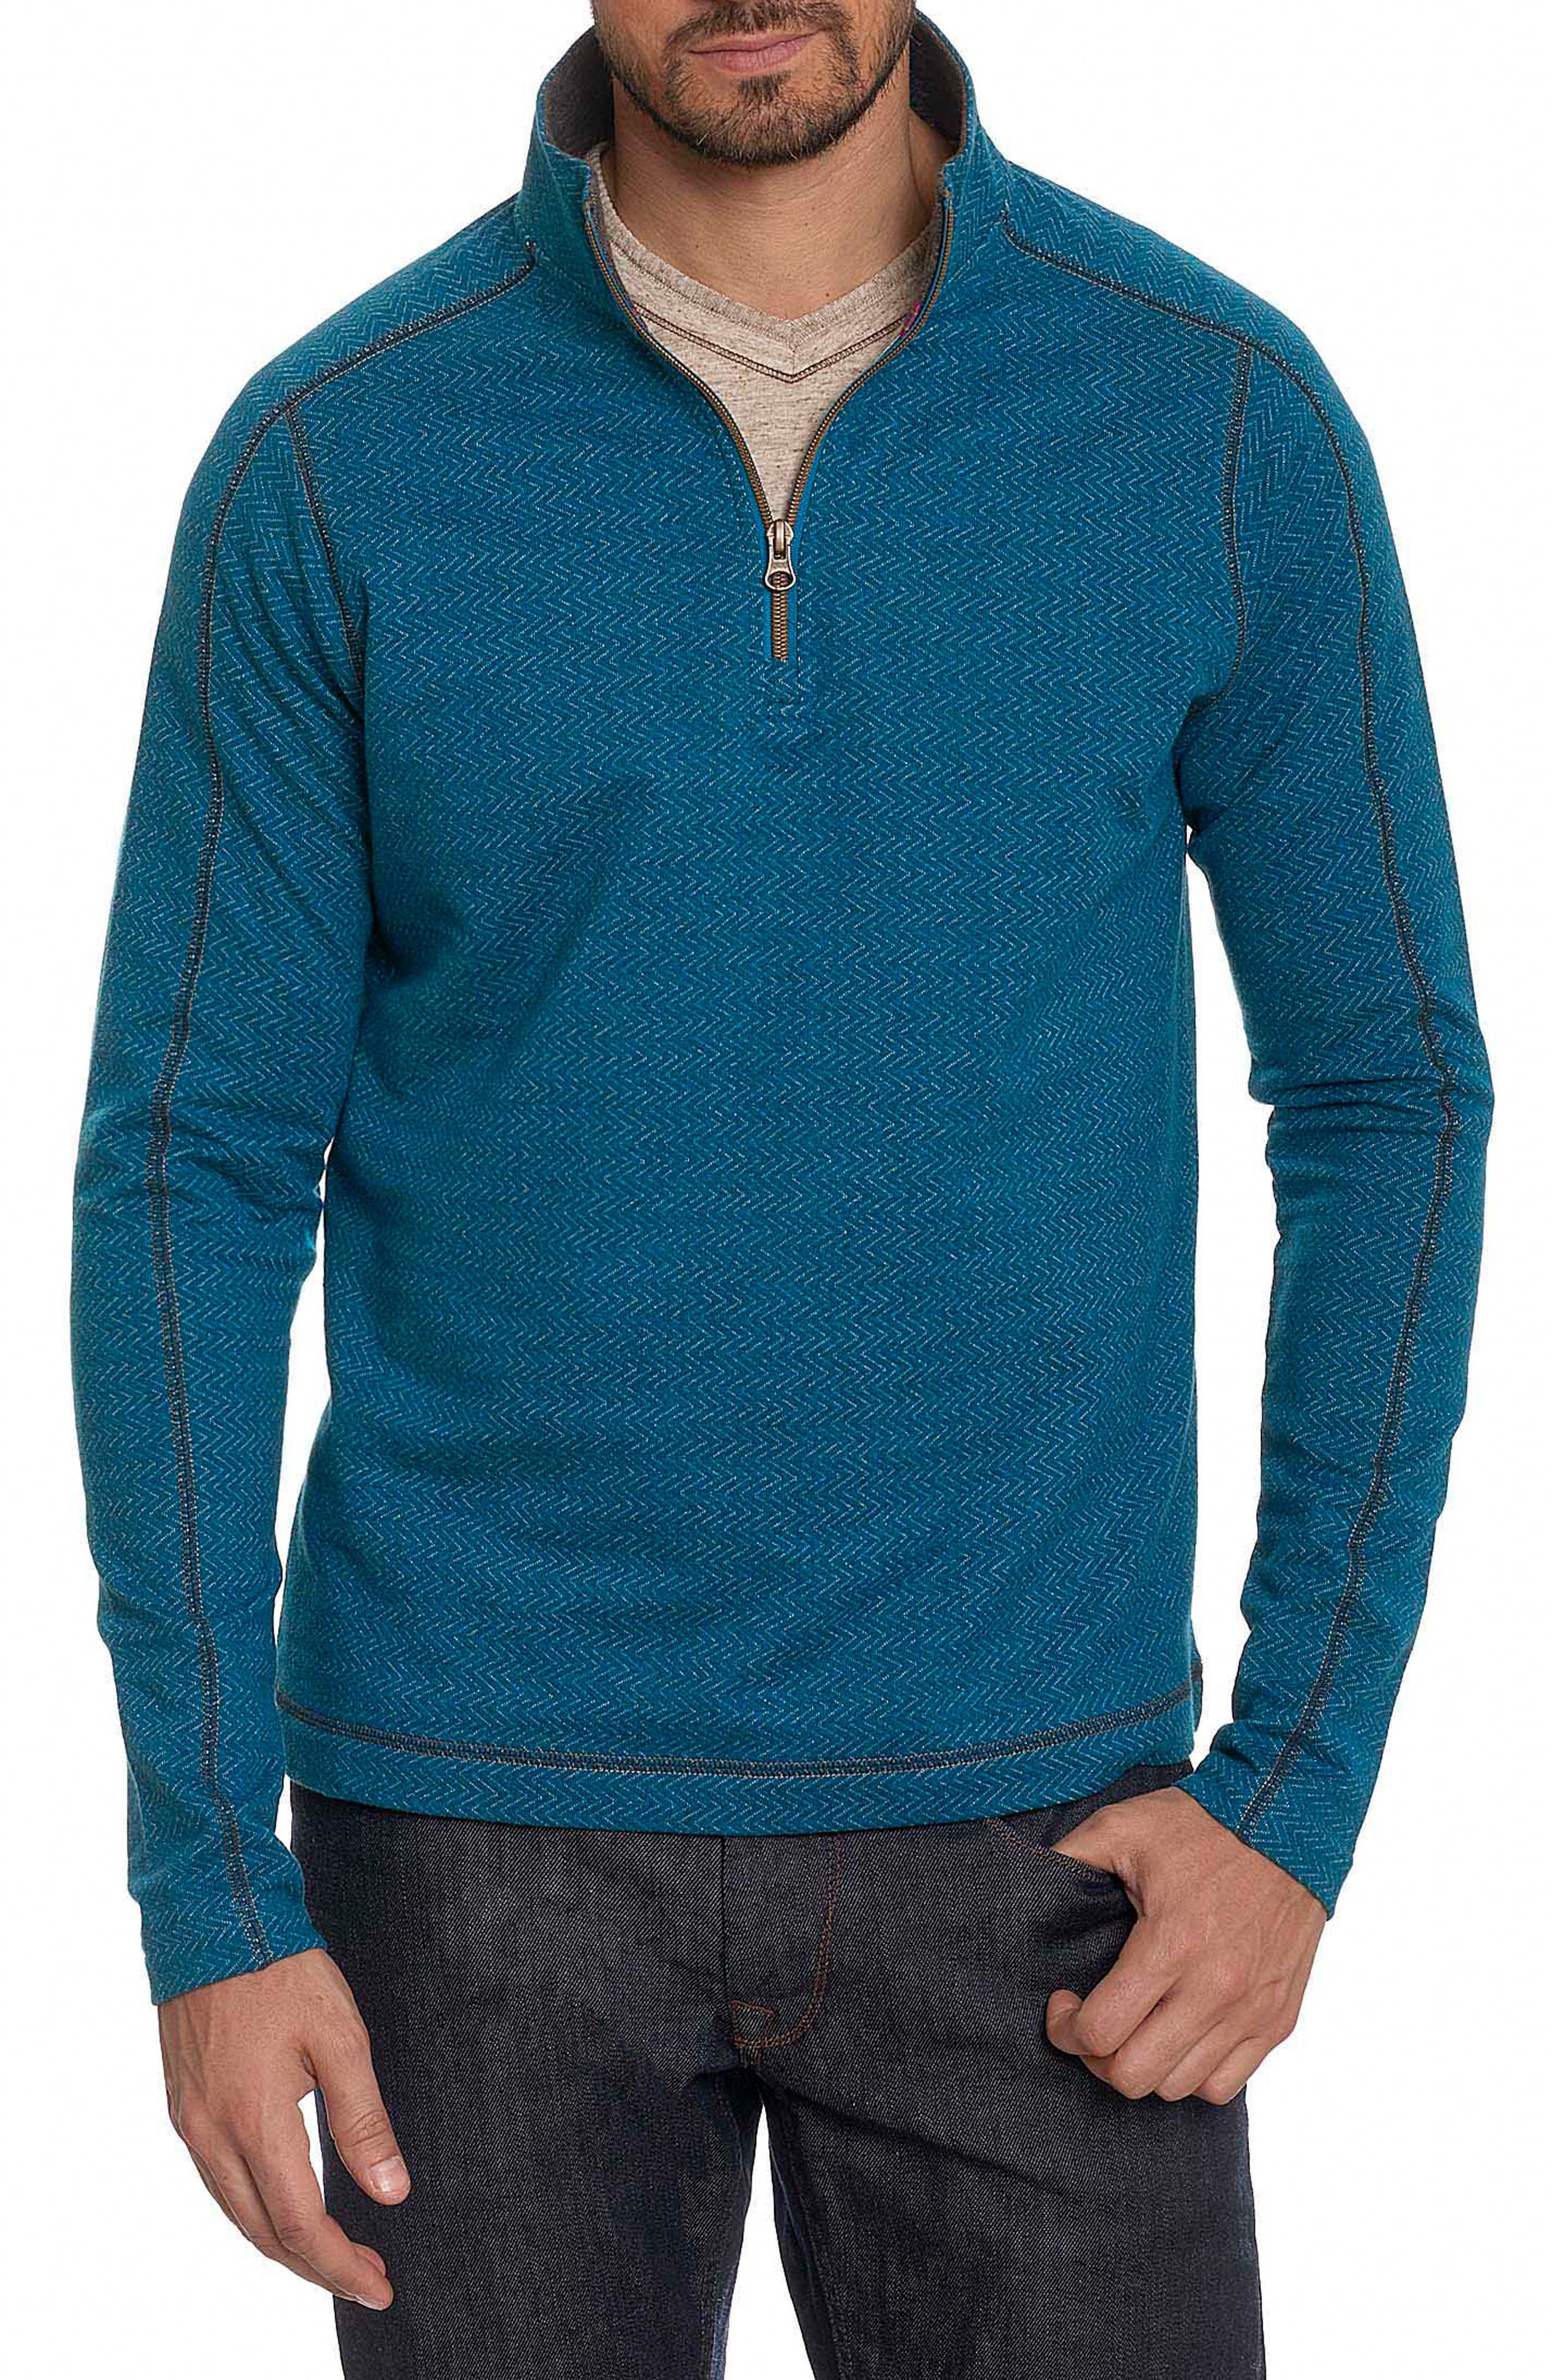 Warrensburg Herringbone Quarter Zip Pullover,                         Main,                         color, Heather Teal